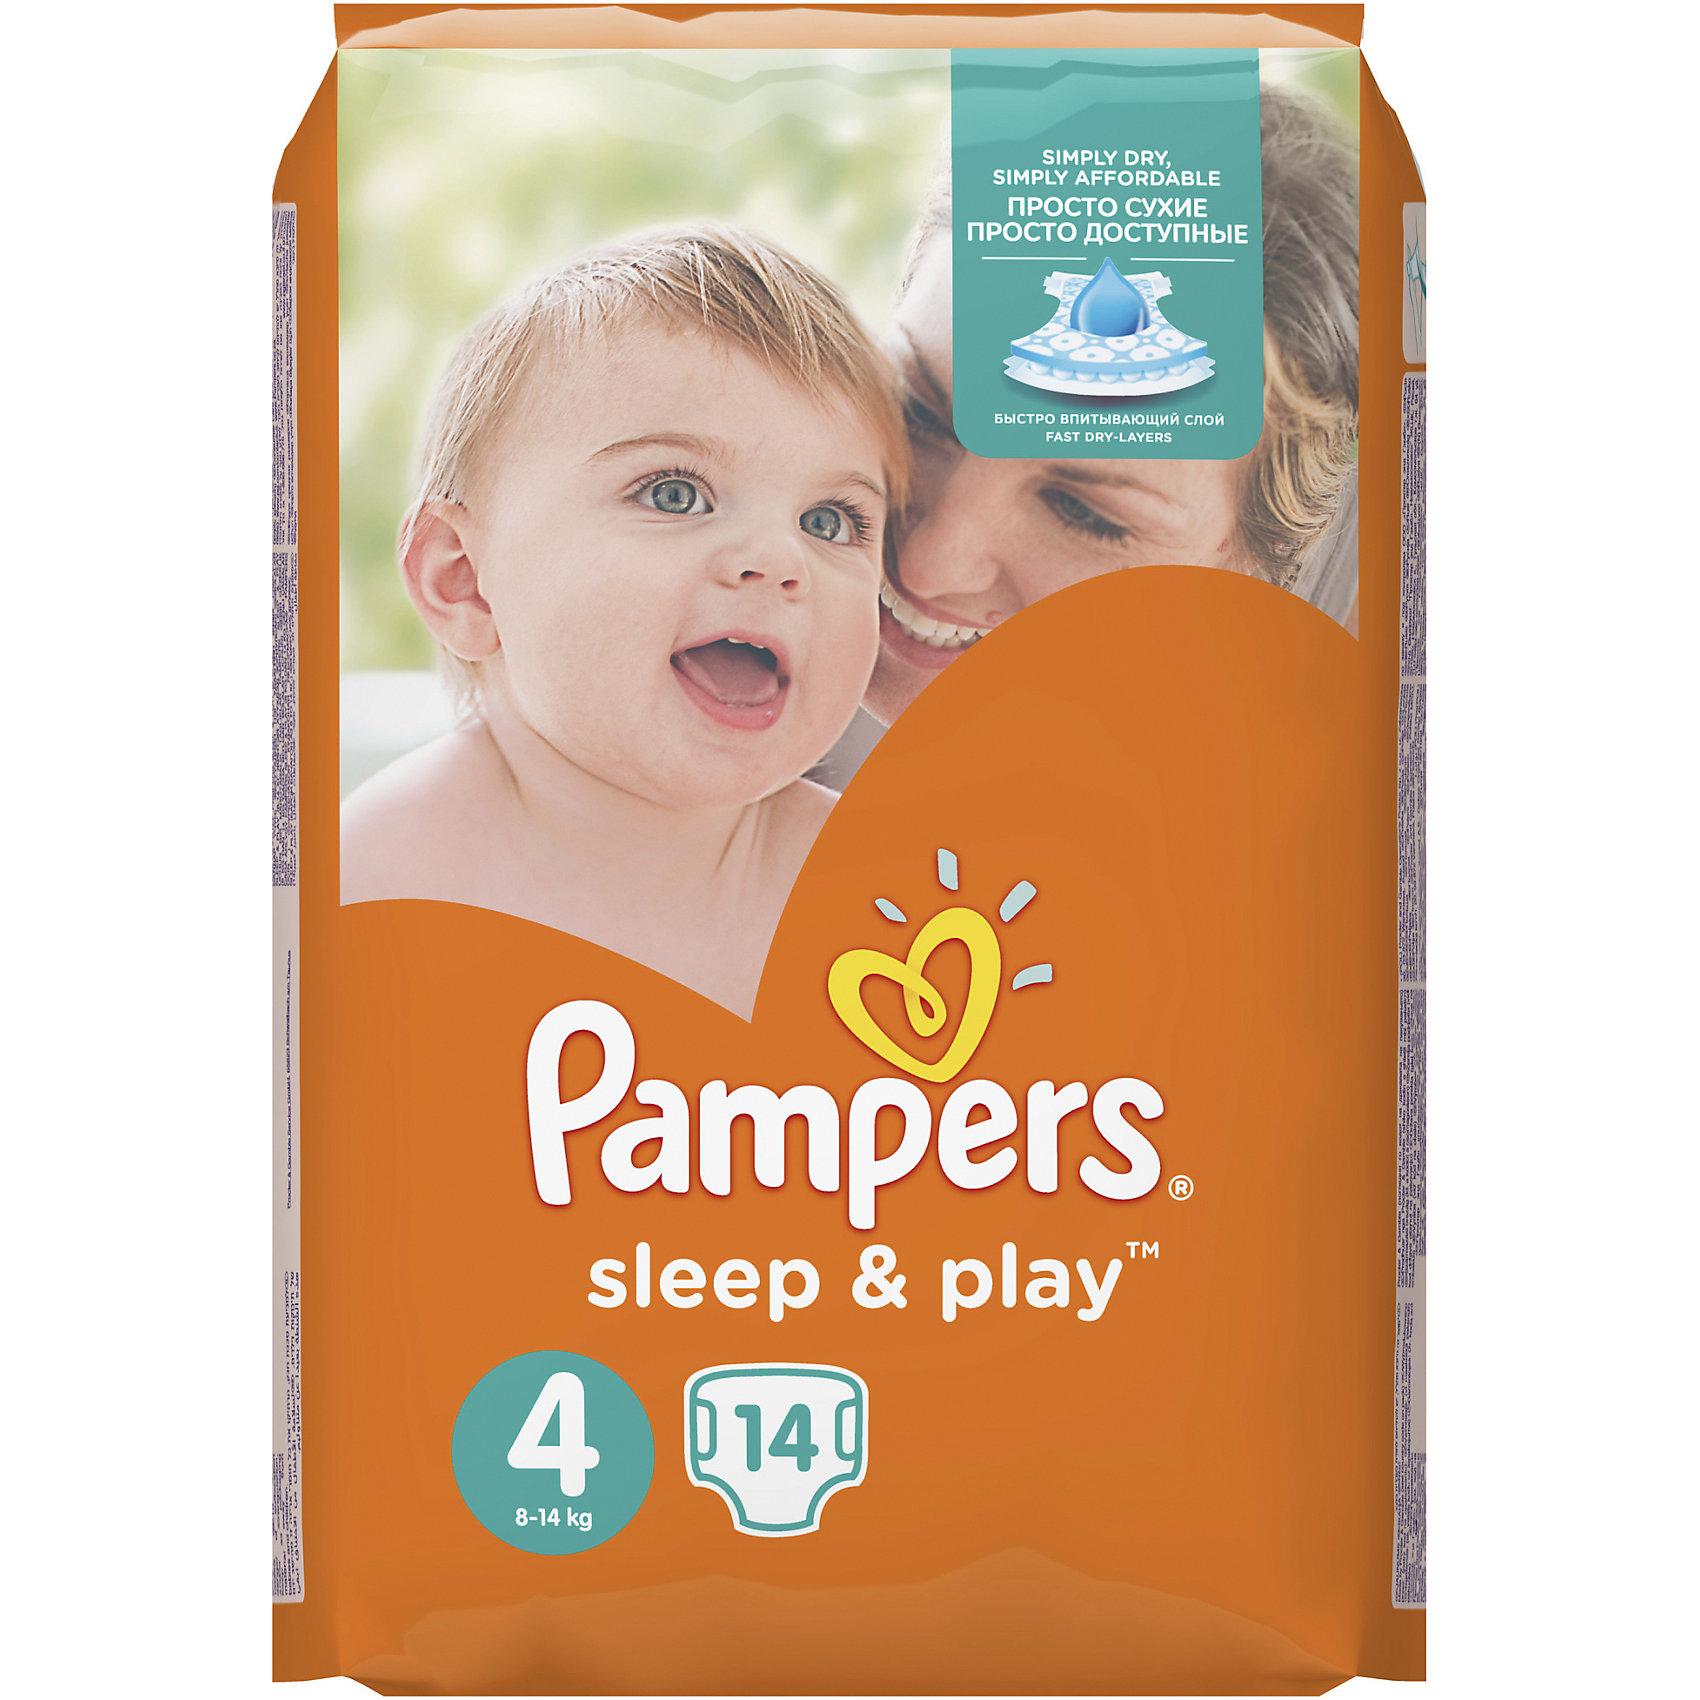 Подгузники Pampers Sleep &amp; Play Maxi, 8-14 кг, 4 размер, 14 шт., PampersПодгузники более 12 кг.<br><br><br>Ширина мм: 136<br>Глубина мм: 116<br>Высота мм: 198<br>Вес г: 326<br>Возраст от месяцев: 12<br>Возраст до месяцев: 24<br>Пол: Унисекс<br>Возраст: Детский<br>SKU: 5516306